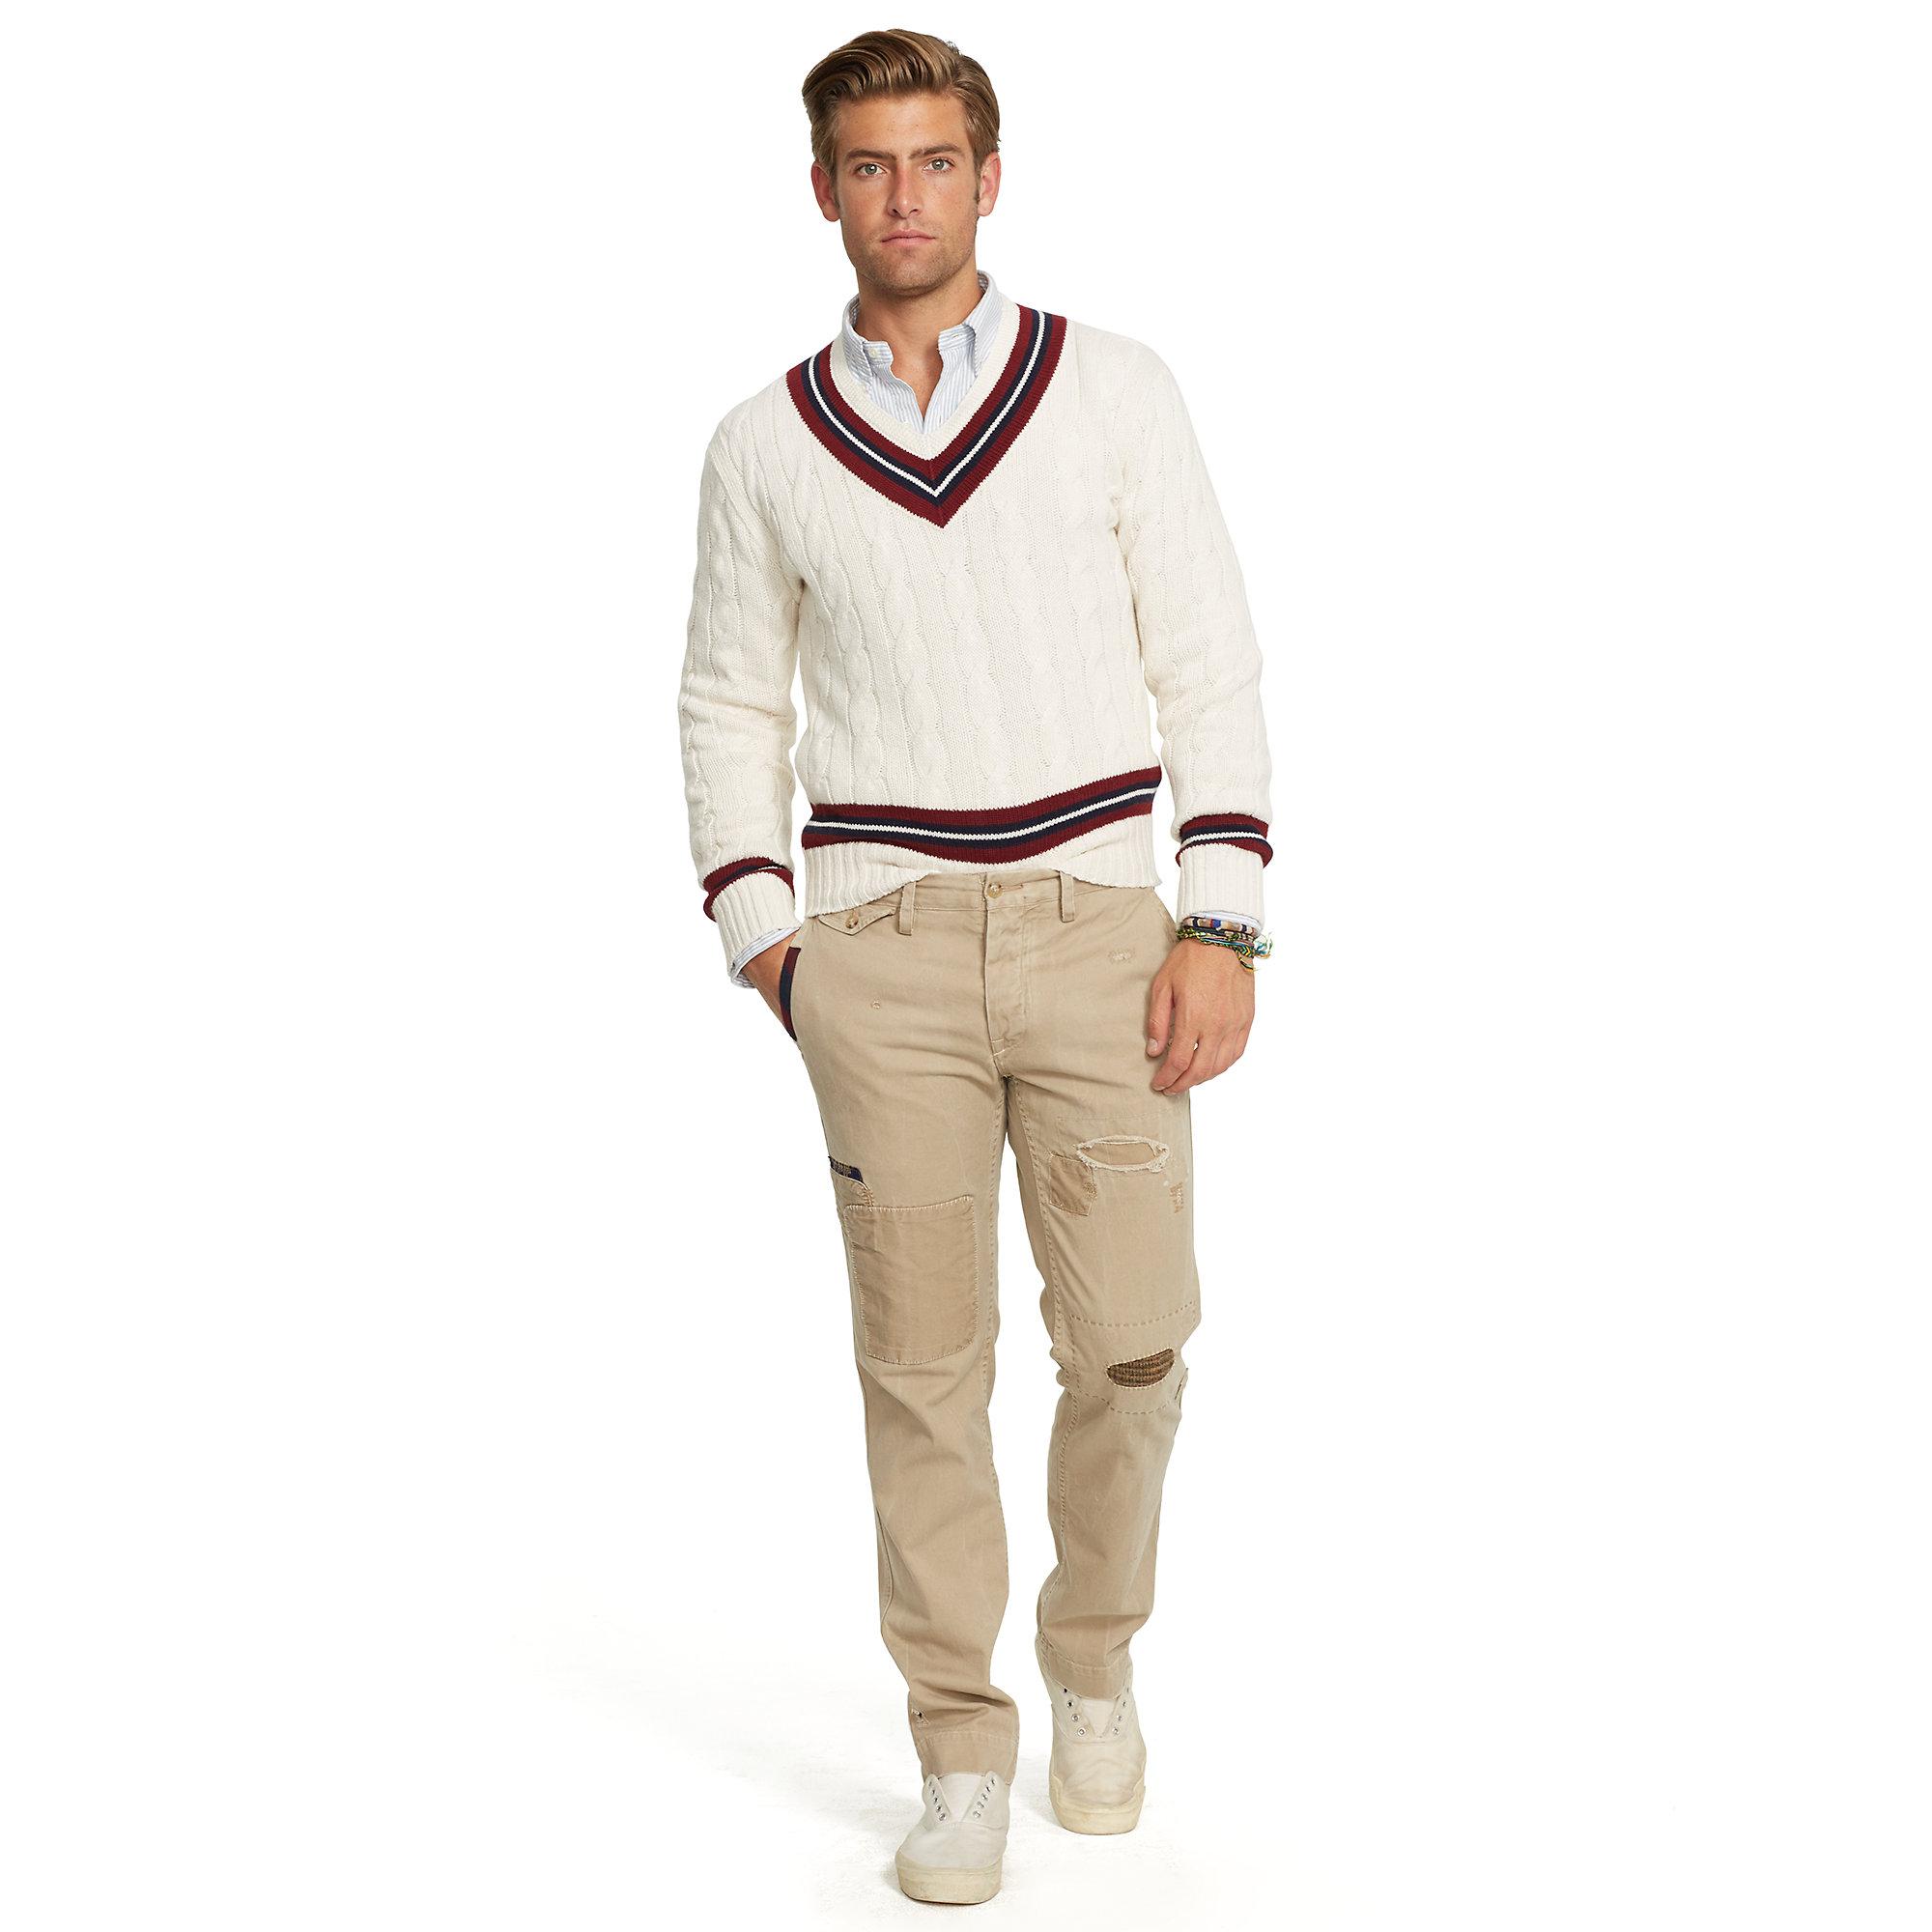 Lyst Polo Ralph Lauren Cotton Blend Cricket Sweater In